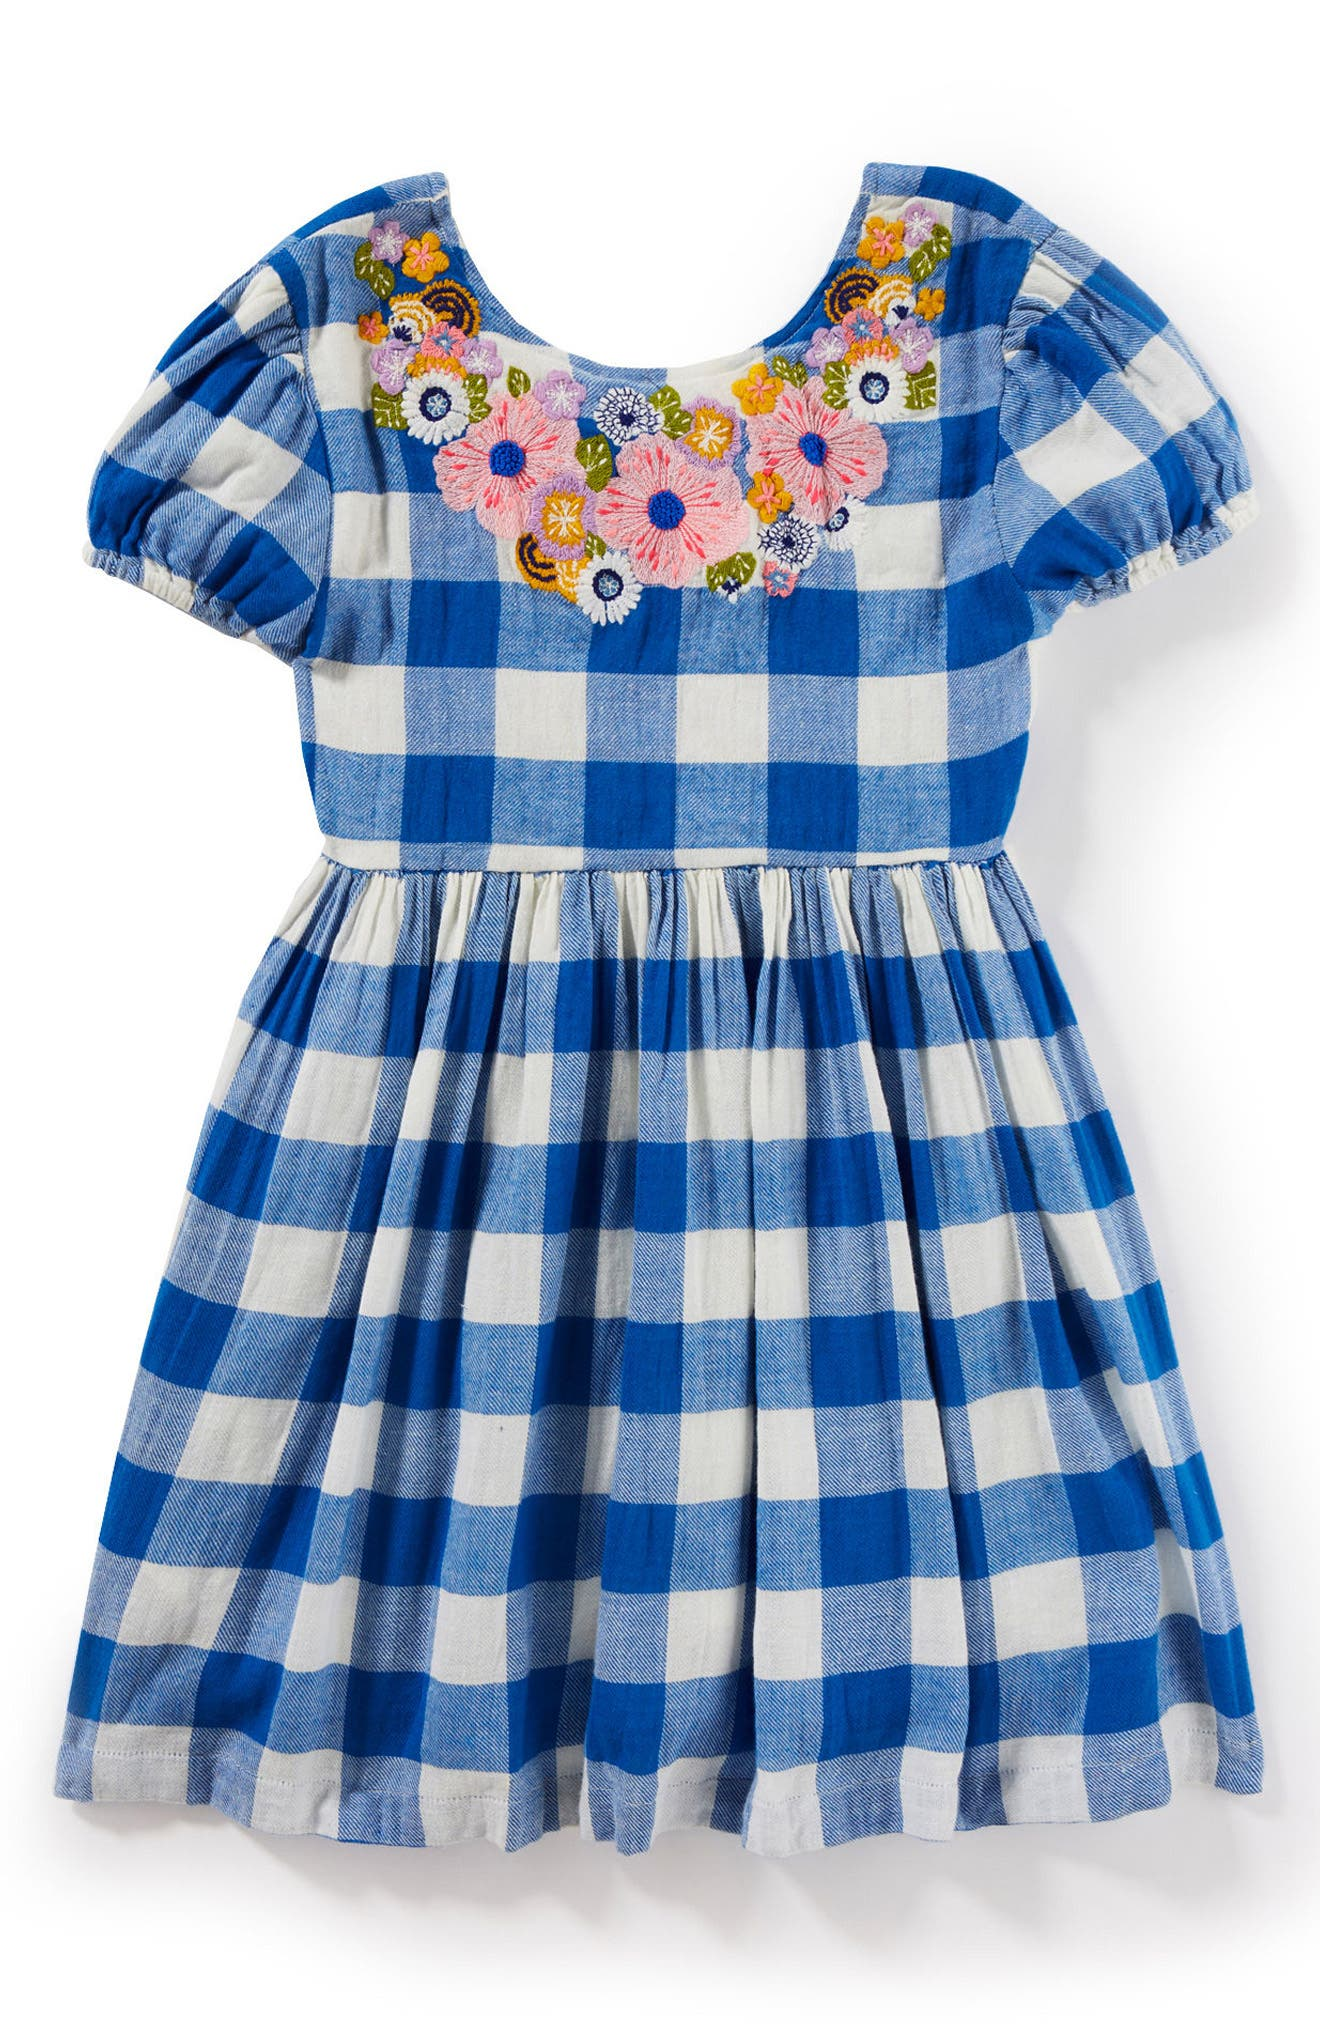 Alternate Image 1 Selected - Peek Penelope Embroidered Check Dress (Toddler Girls, Little Girls & Big Girls)